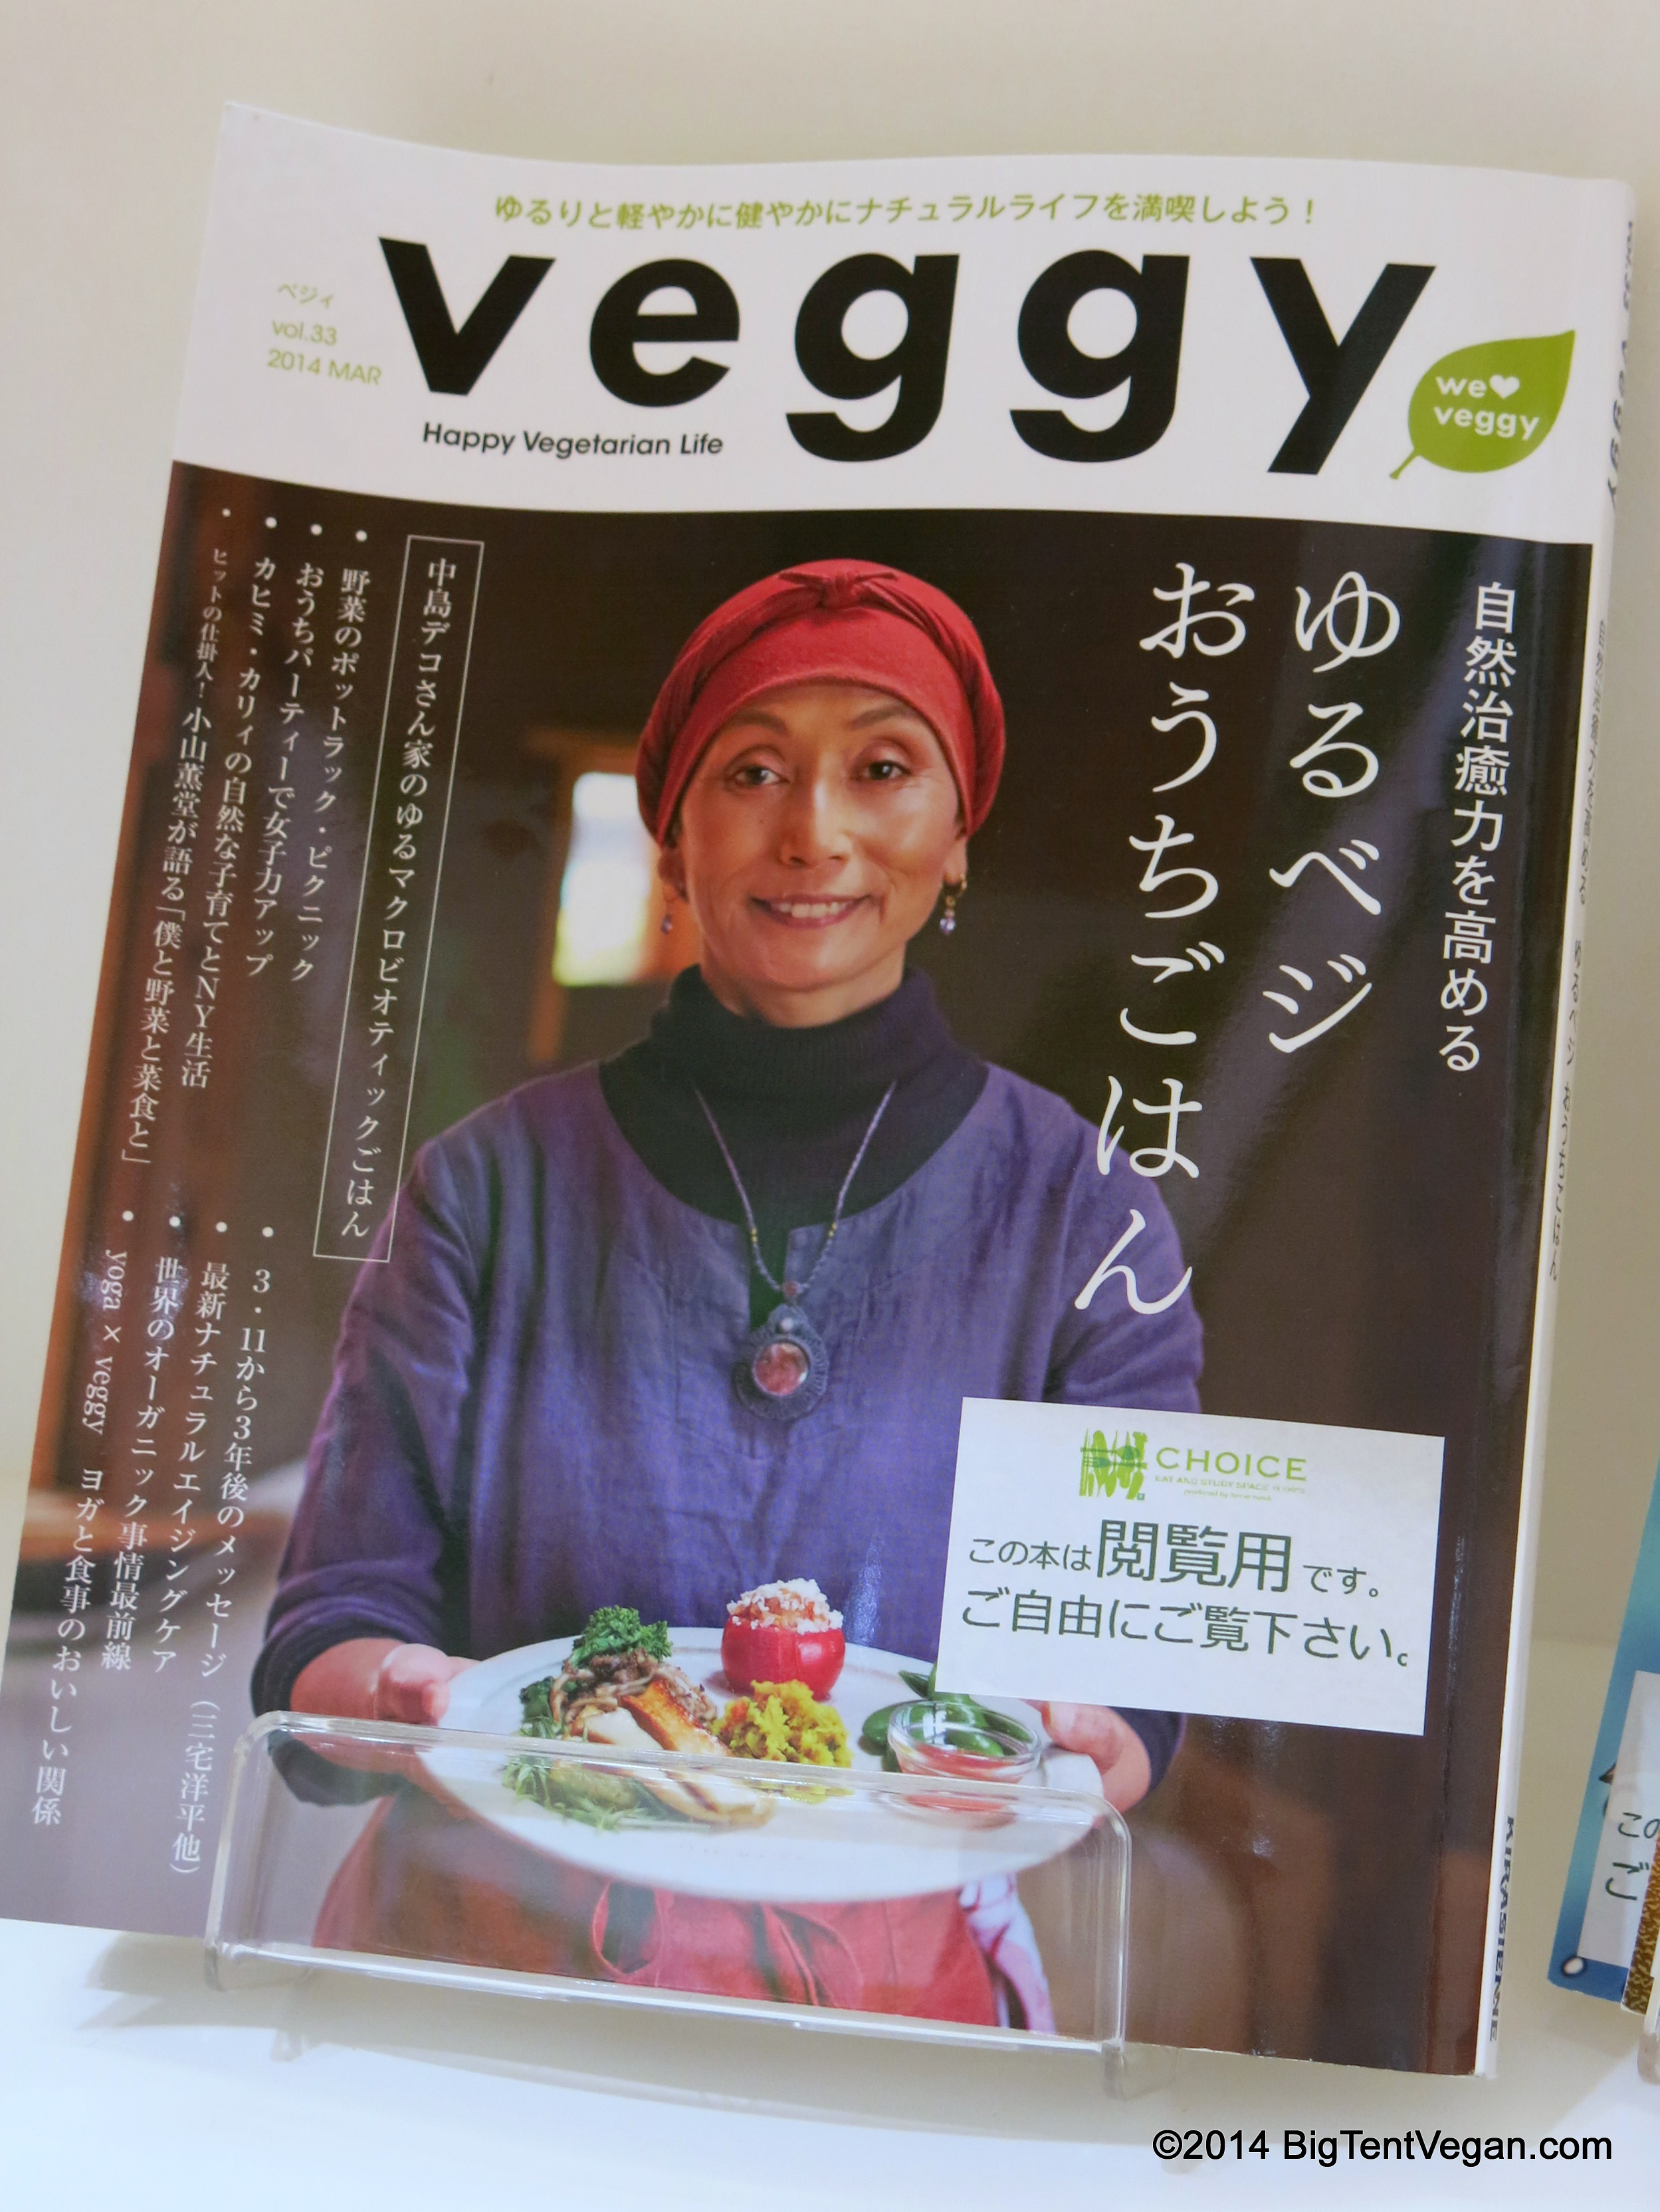 Japanese Vegetarian magazine  Veggy: Happy Vegetarian Life